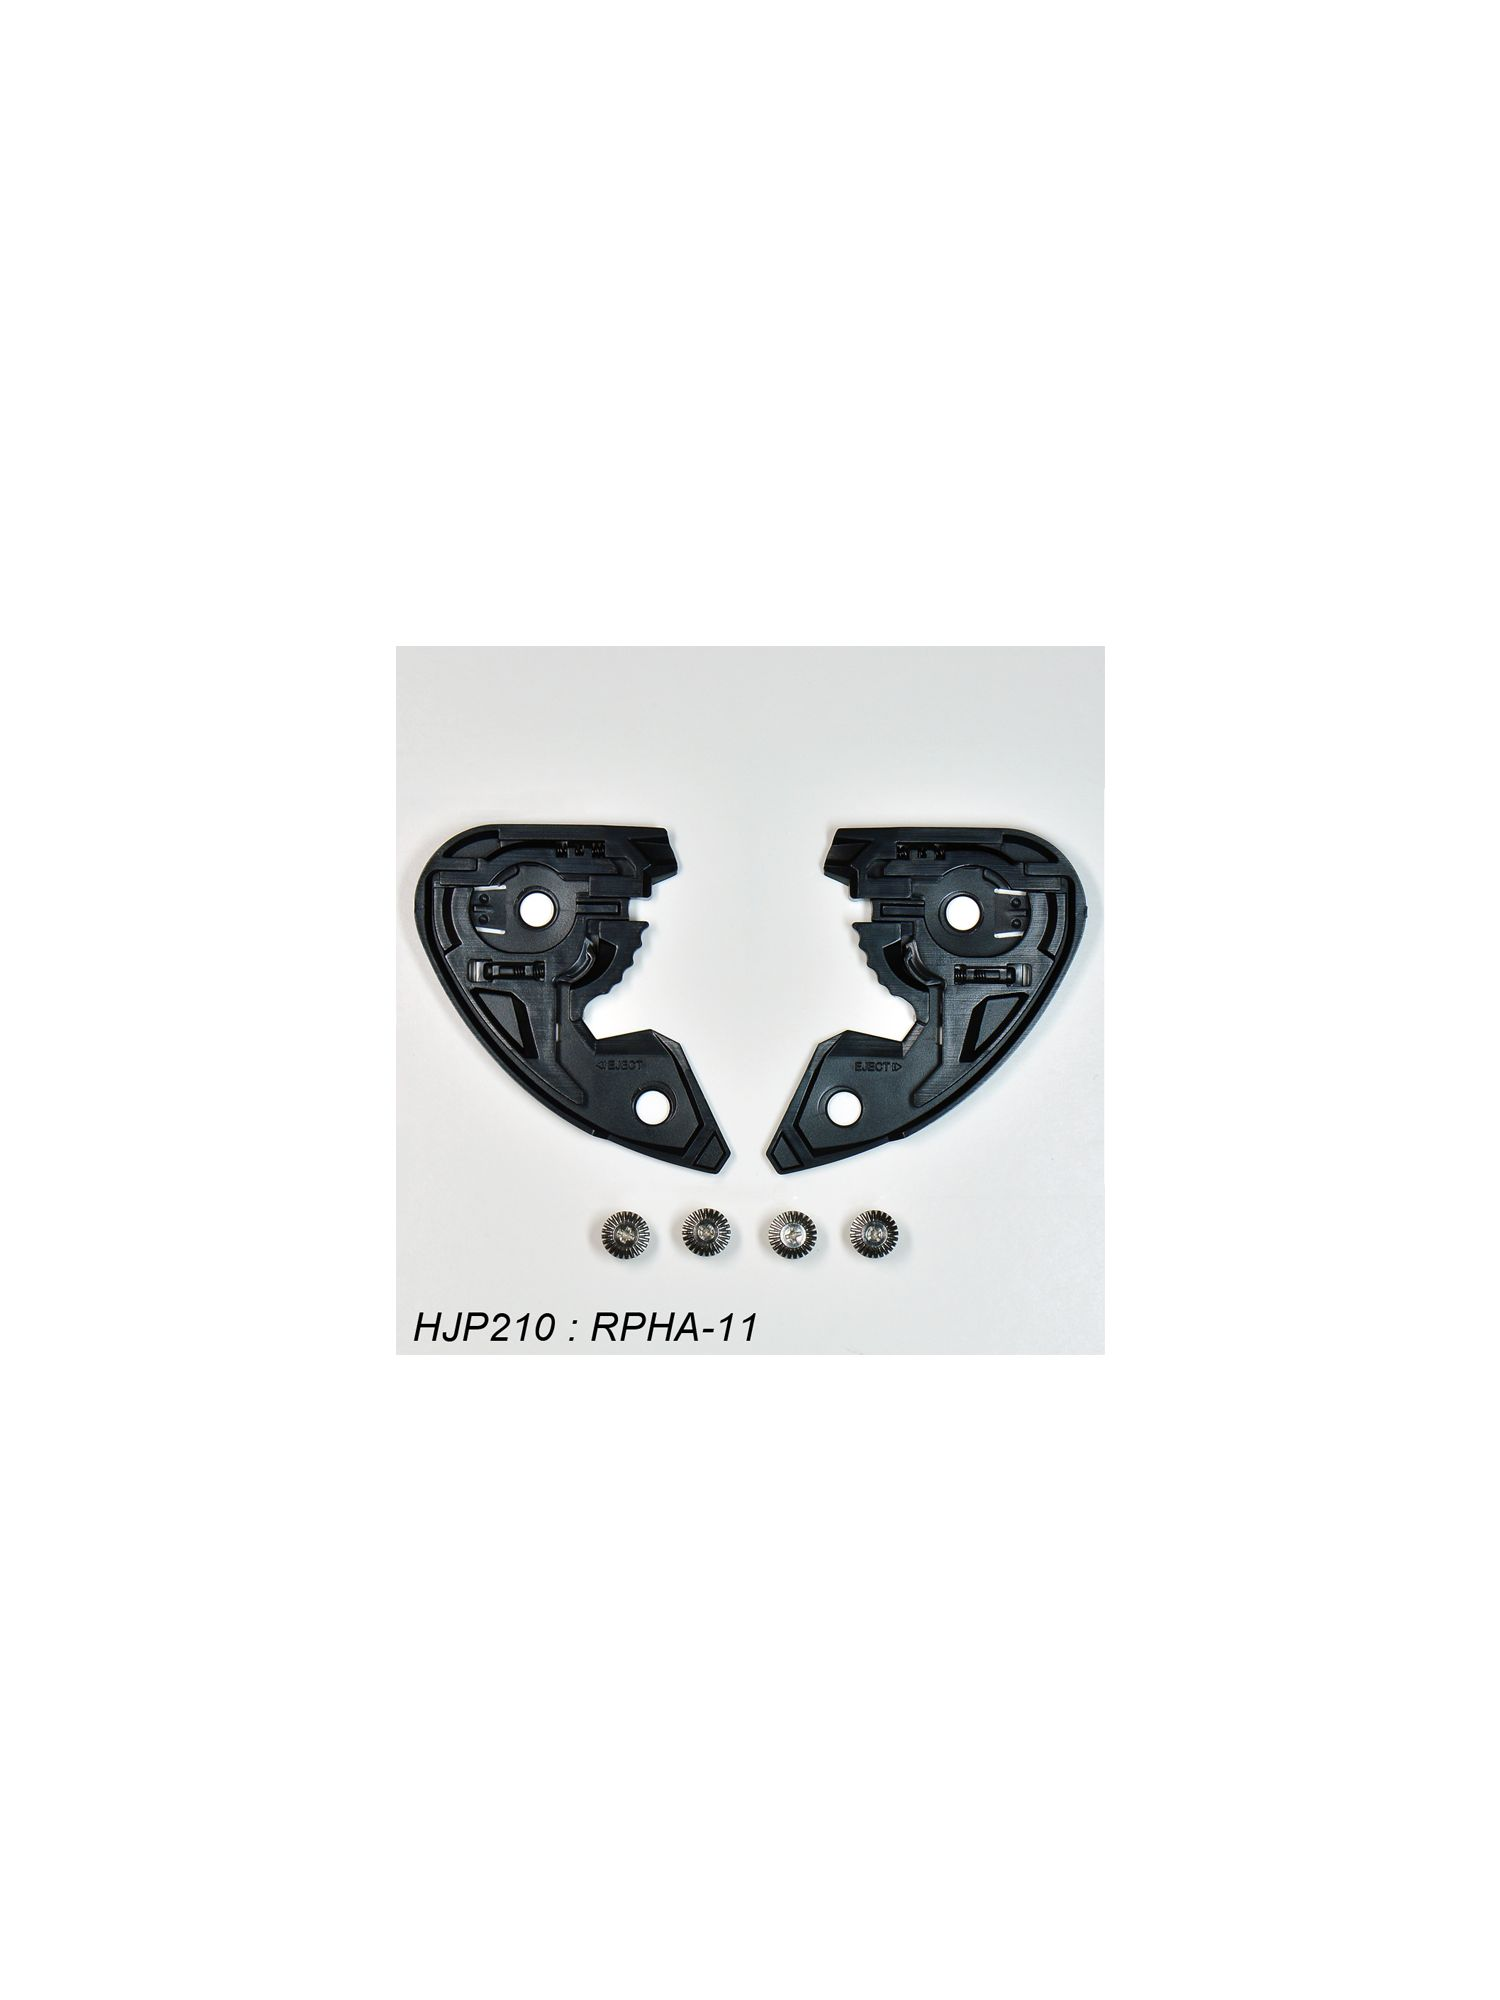 HJP210 | ギアプレートセット:RPHA11.RPHA70